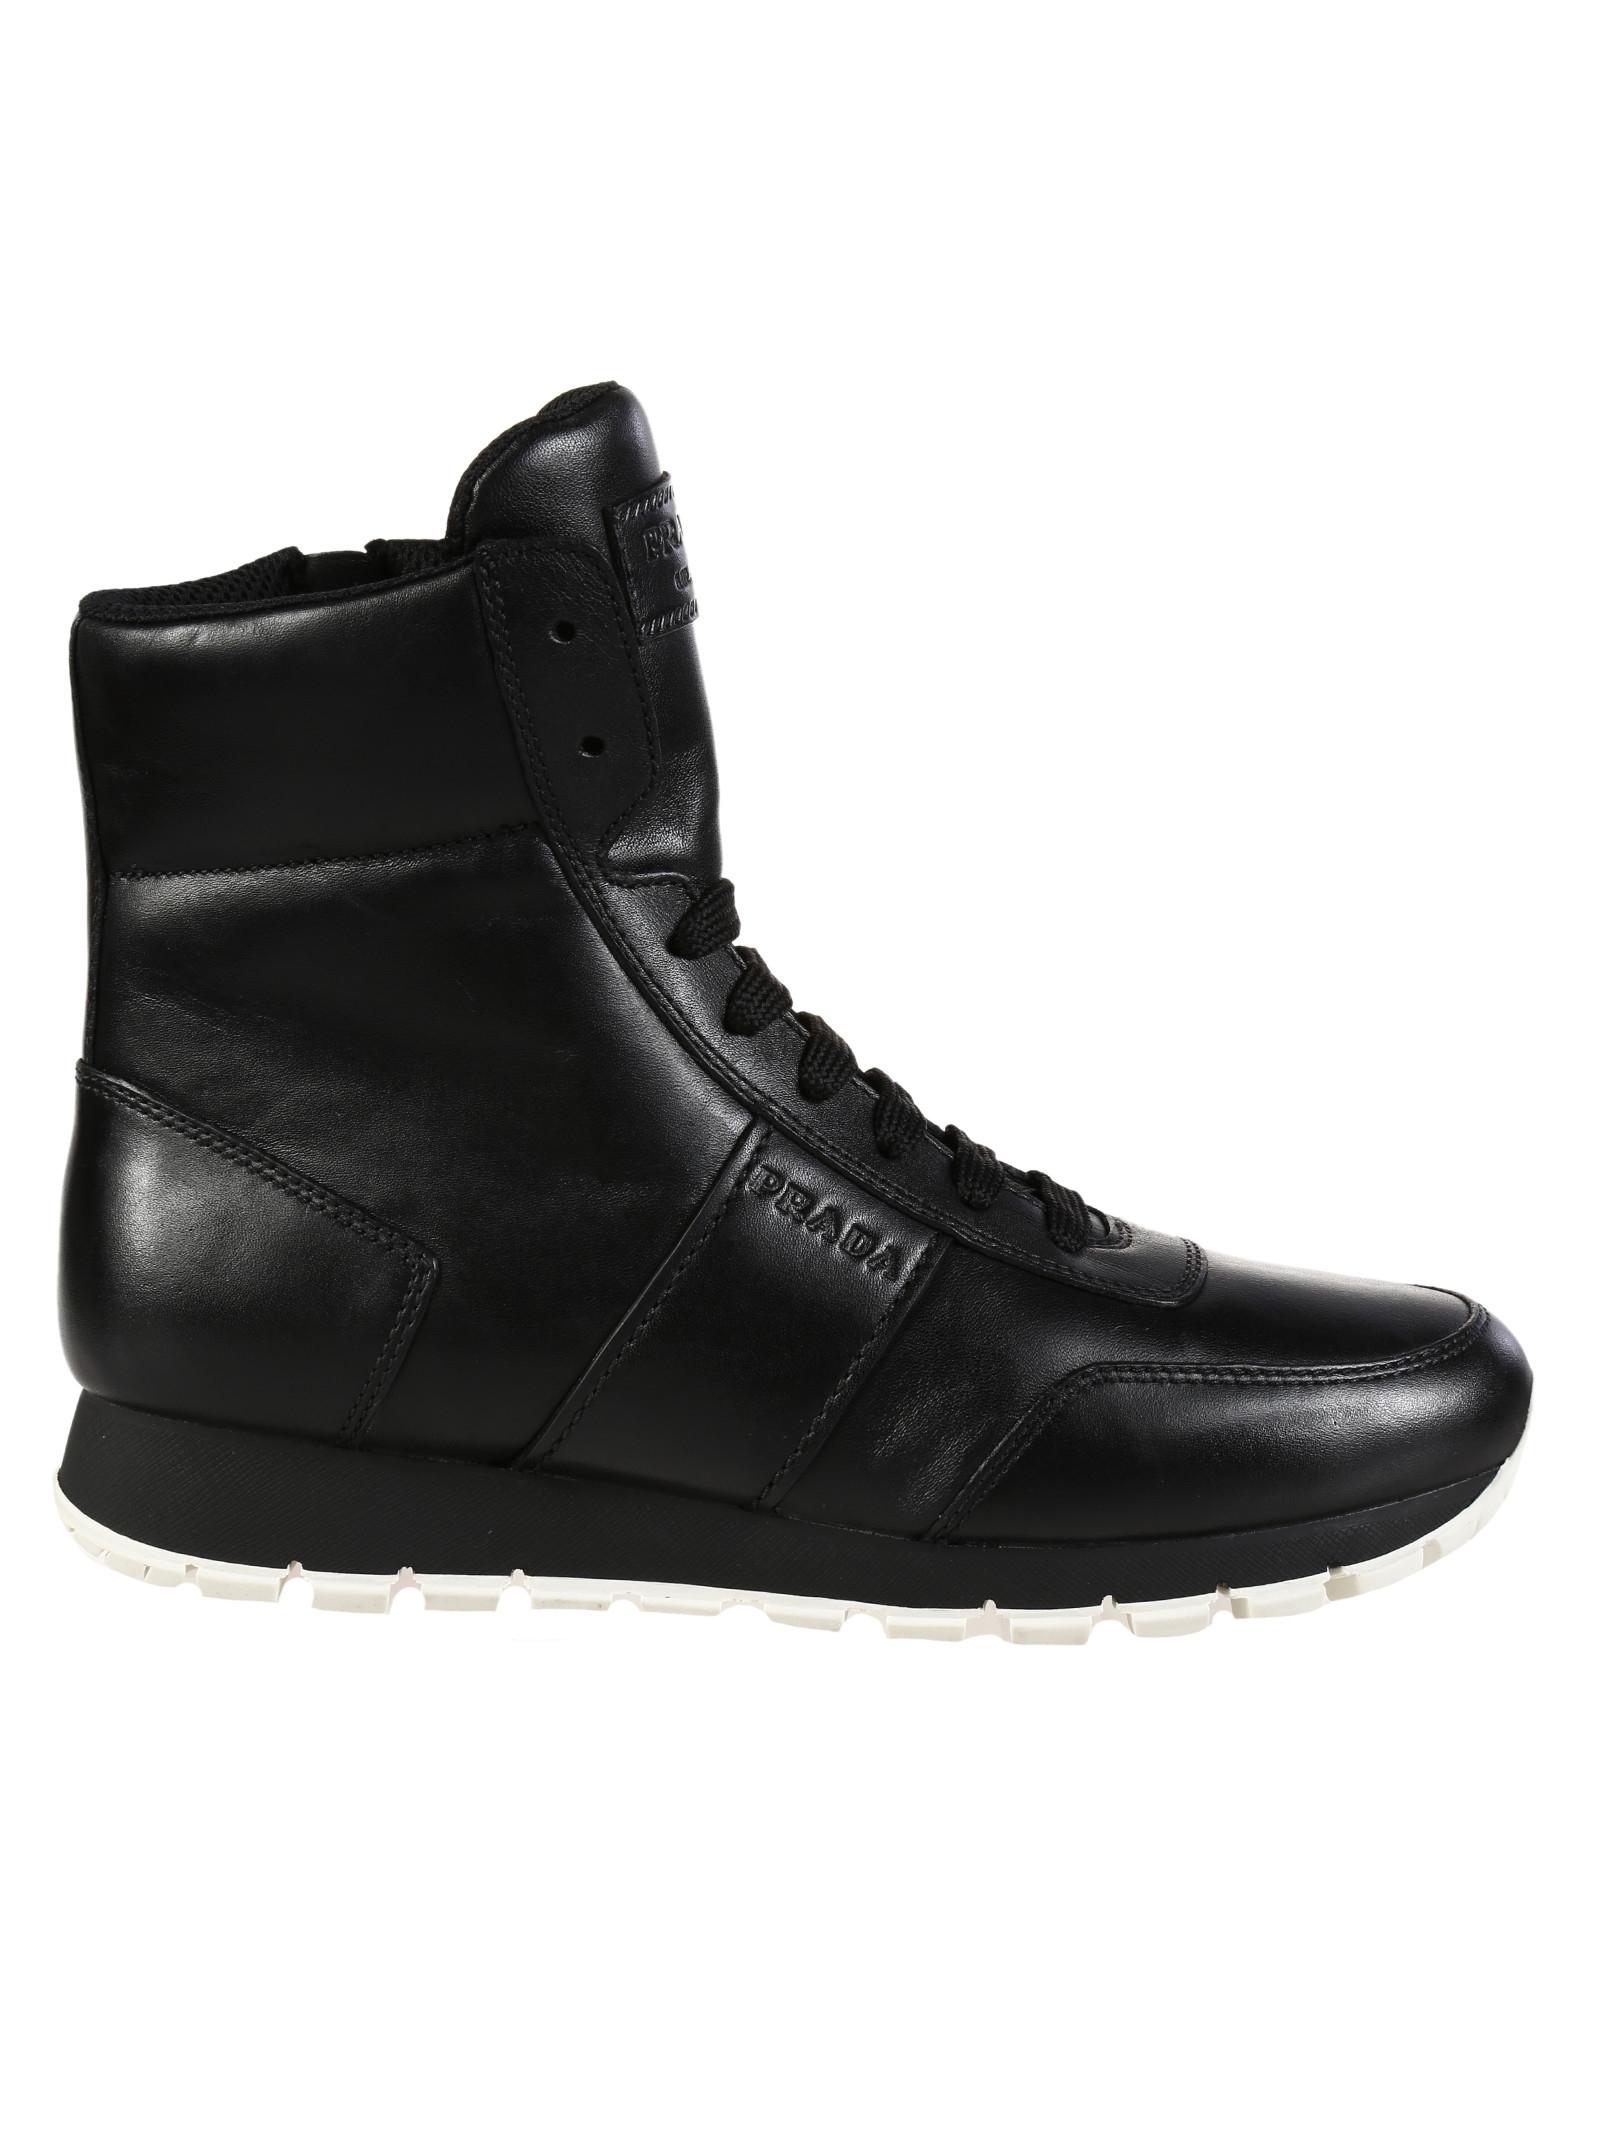 prada linea rossa leather boots in black lyst